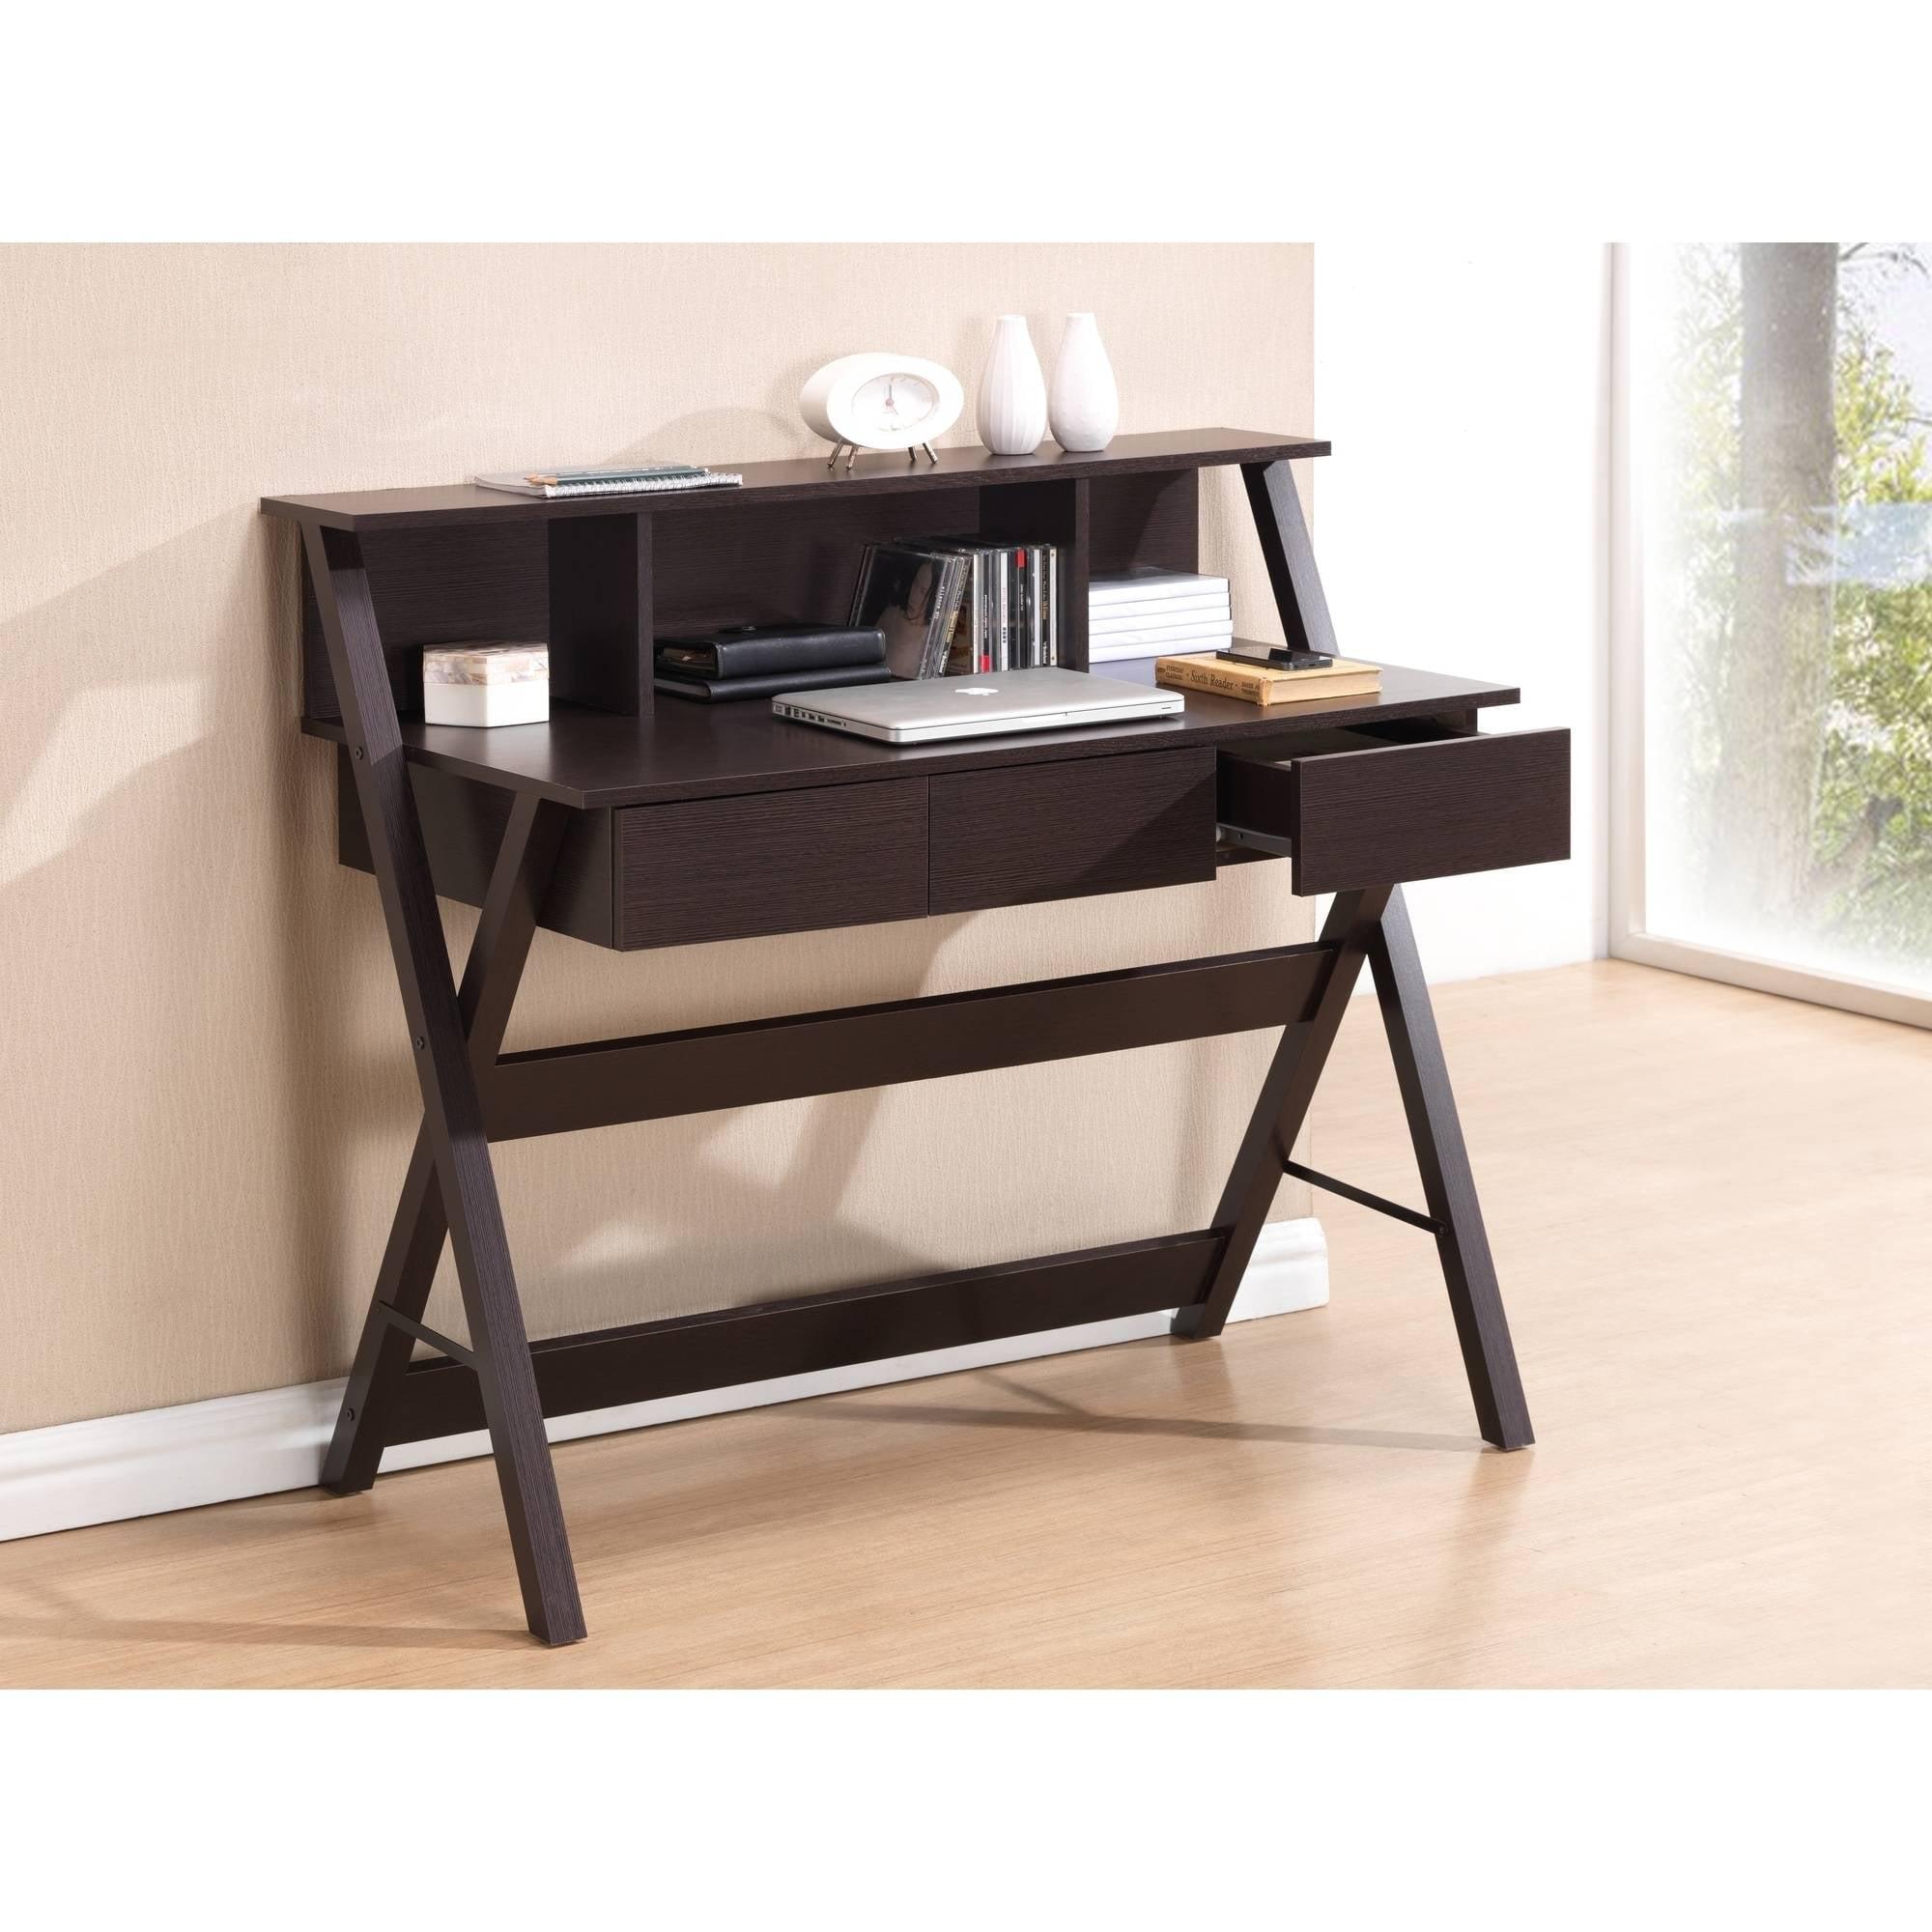 Techni Mobili 3-Drawer Writing Desk with Storage Shelf, Wenge (RTA-8400-WN)